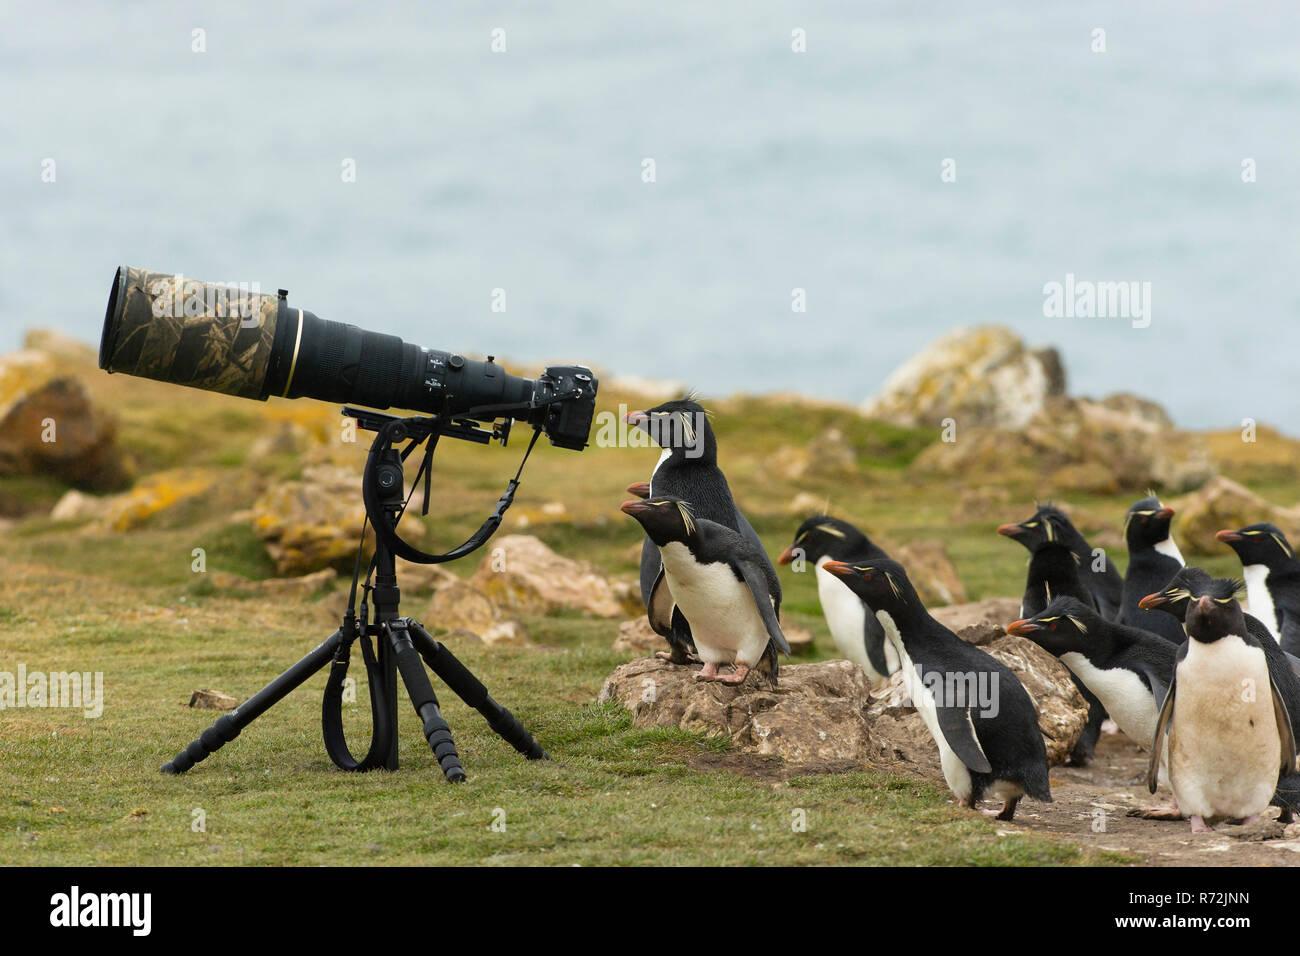 Pebble Island, Falkland Islands, United Kingdom, Southern rockhopper penguine behind camera with telephoto lens, (Eudyptes chrysocome) - Stock Image